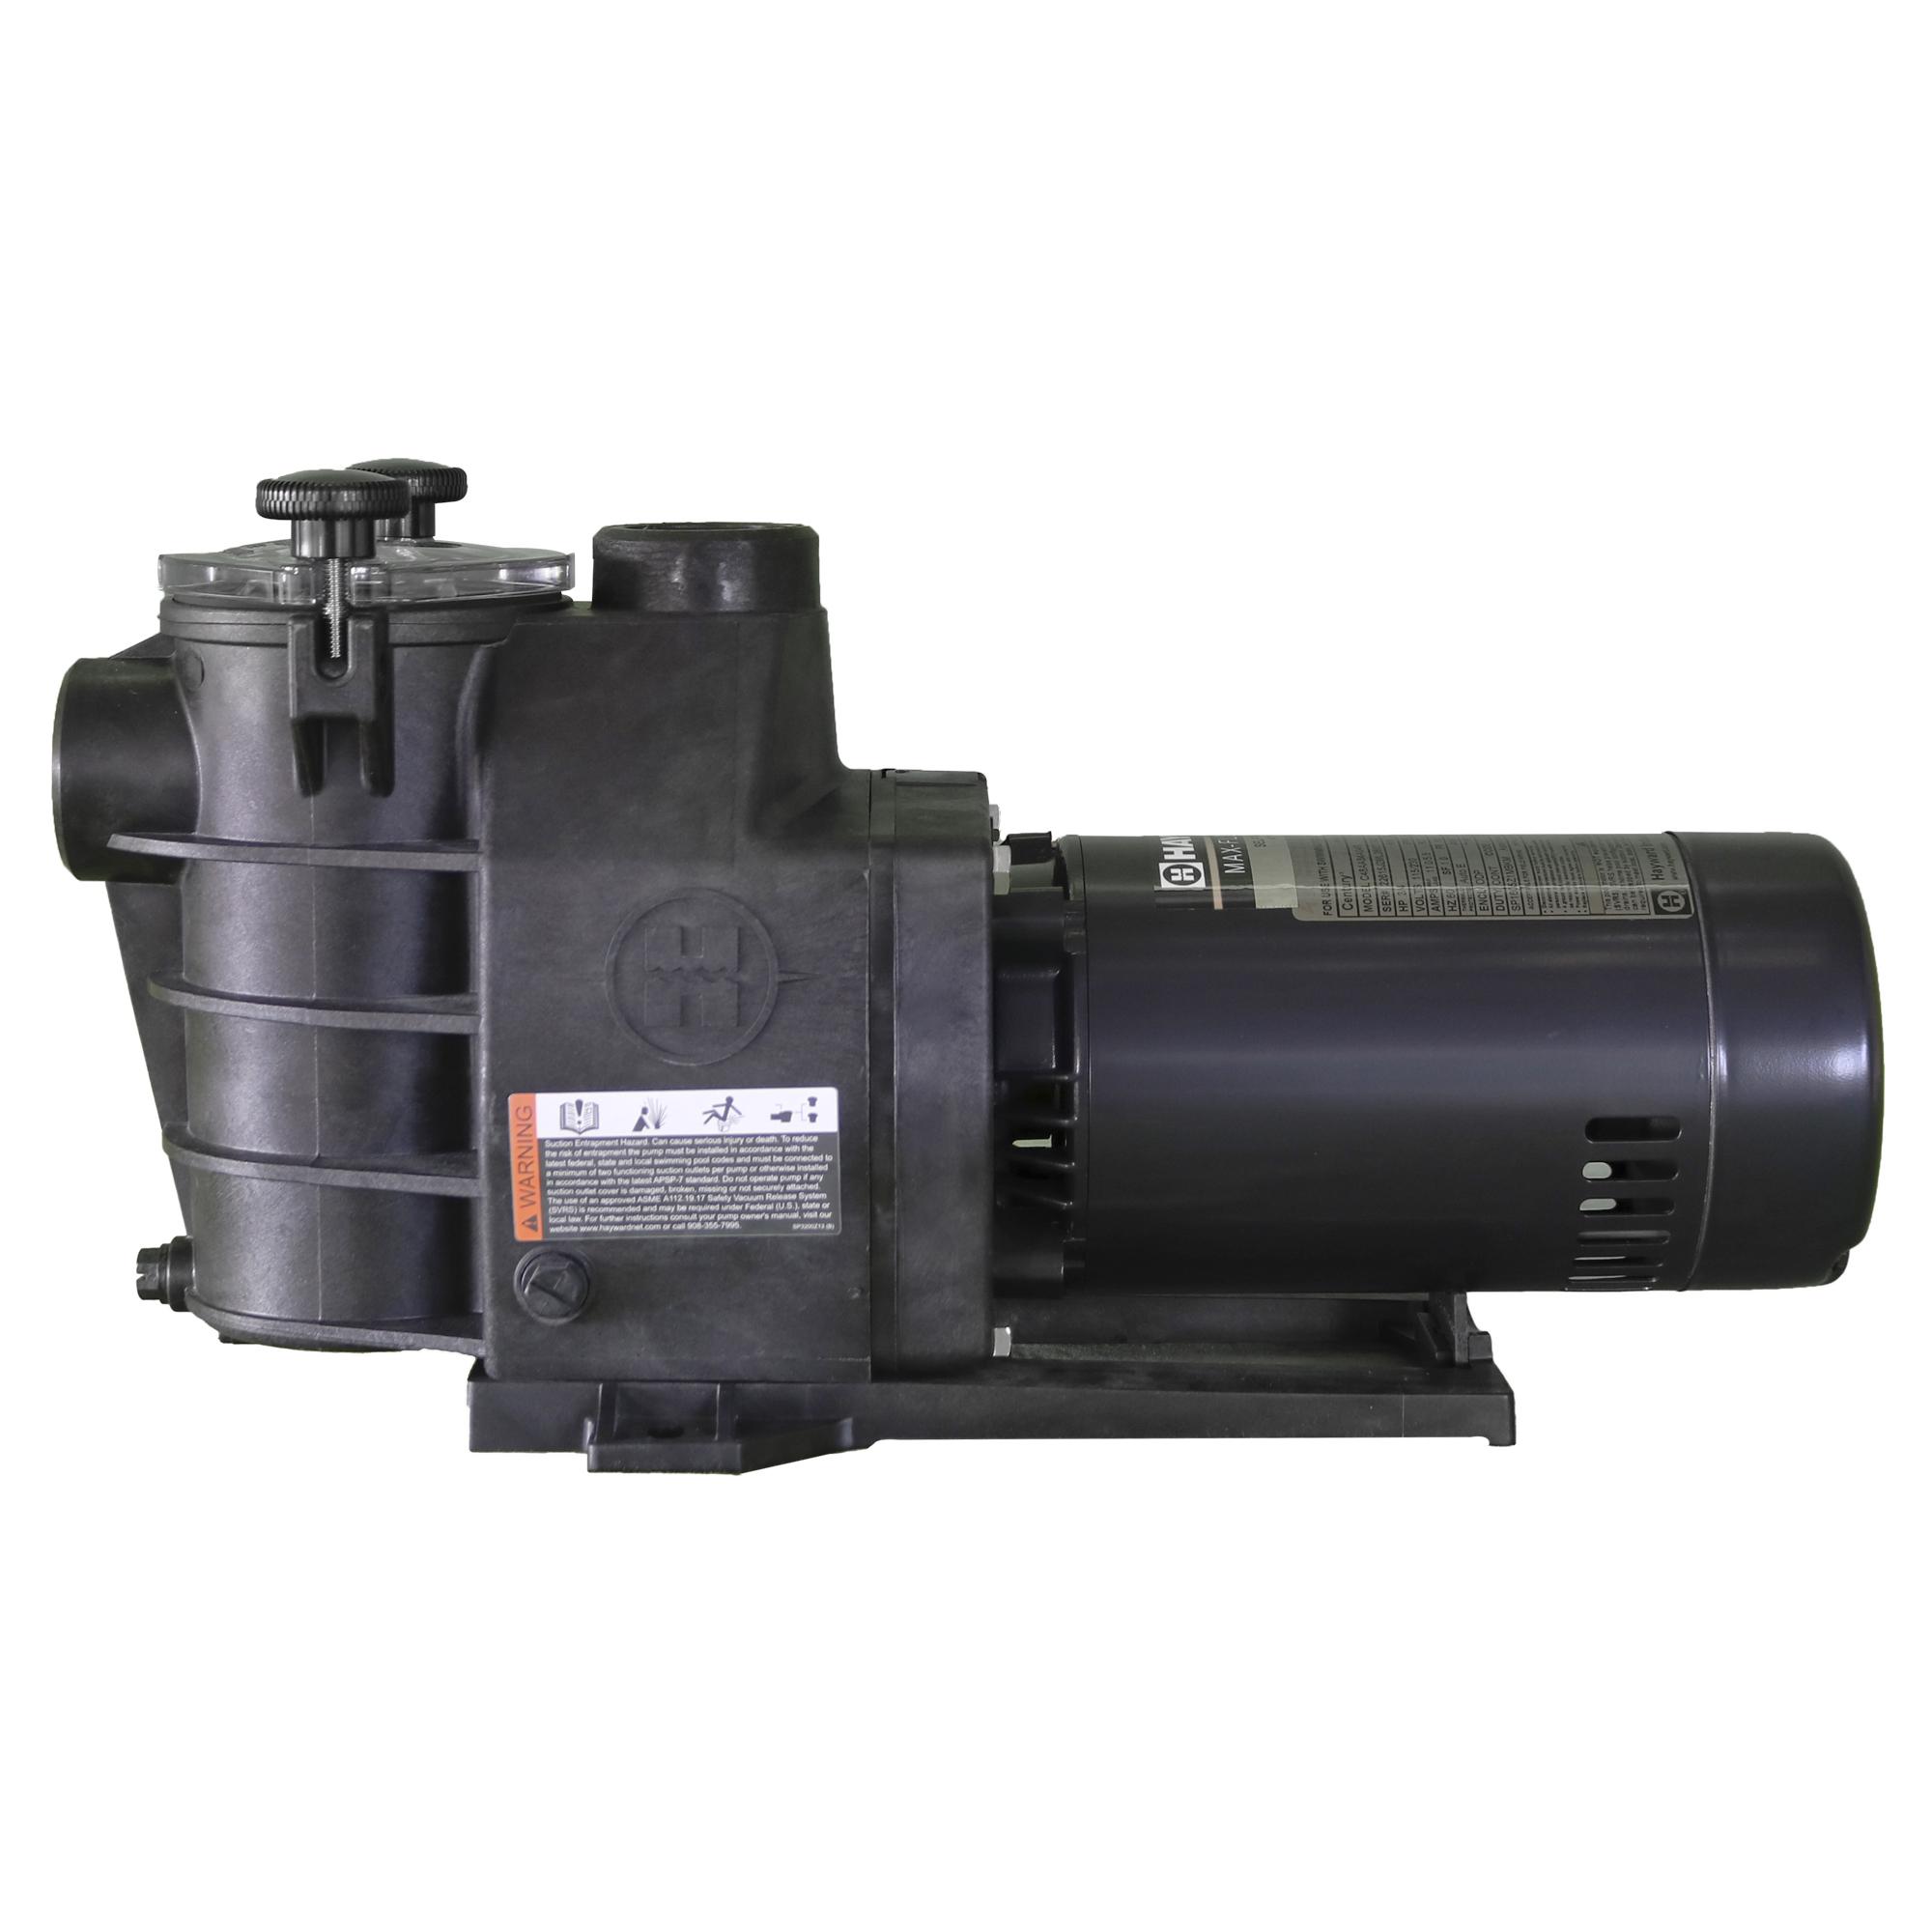 Bomba hayward de 3 4 hp mod max flo mono sp2805x7 for Bombas hayward para piscinas